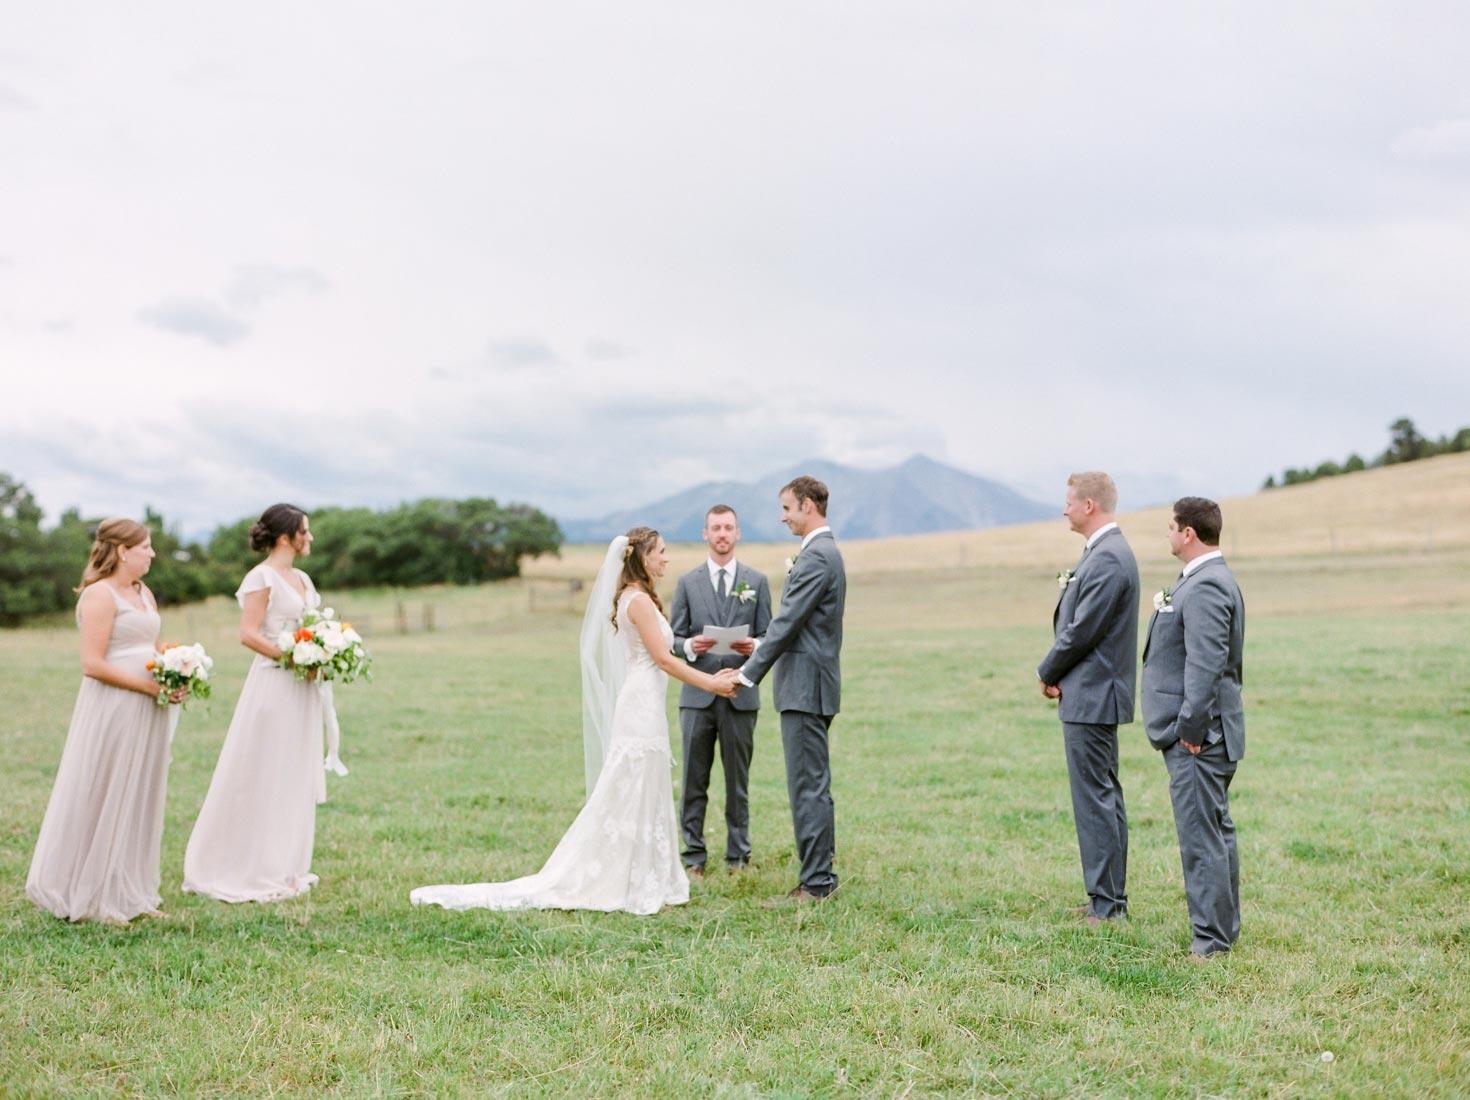 Megan_Zack_Cedar_Ridge_Ranch_Wedding_by_Connie_Whitlock_web_277.jpg